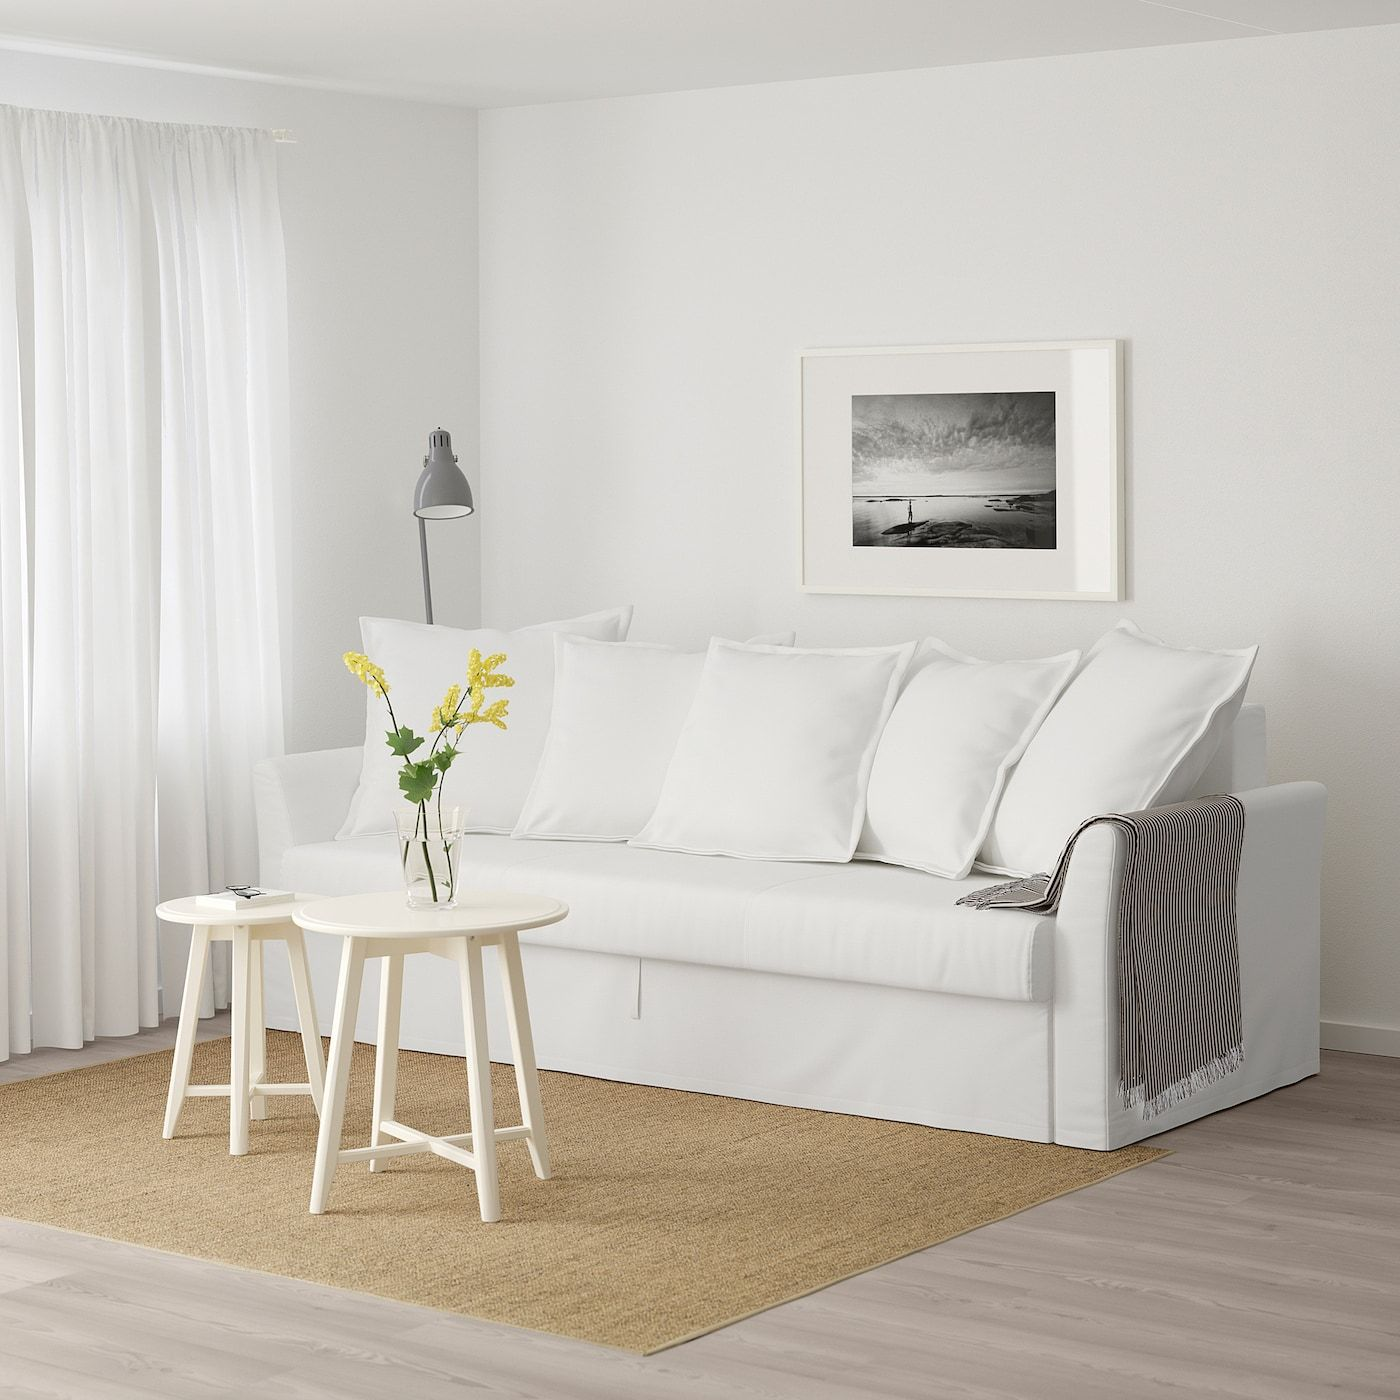 HOLMSUND Gräsbo white, Threeseat sofabed IKEA in 2020